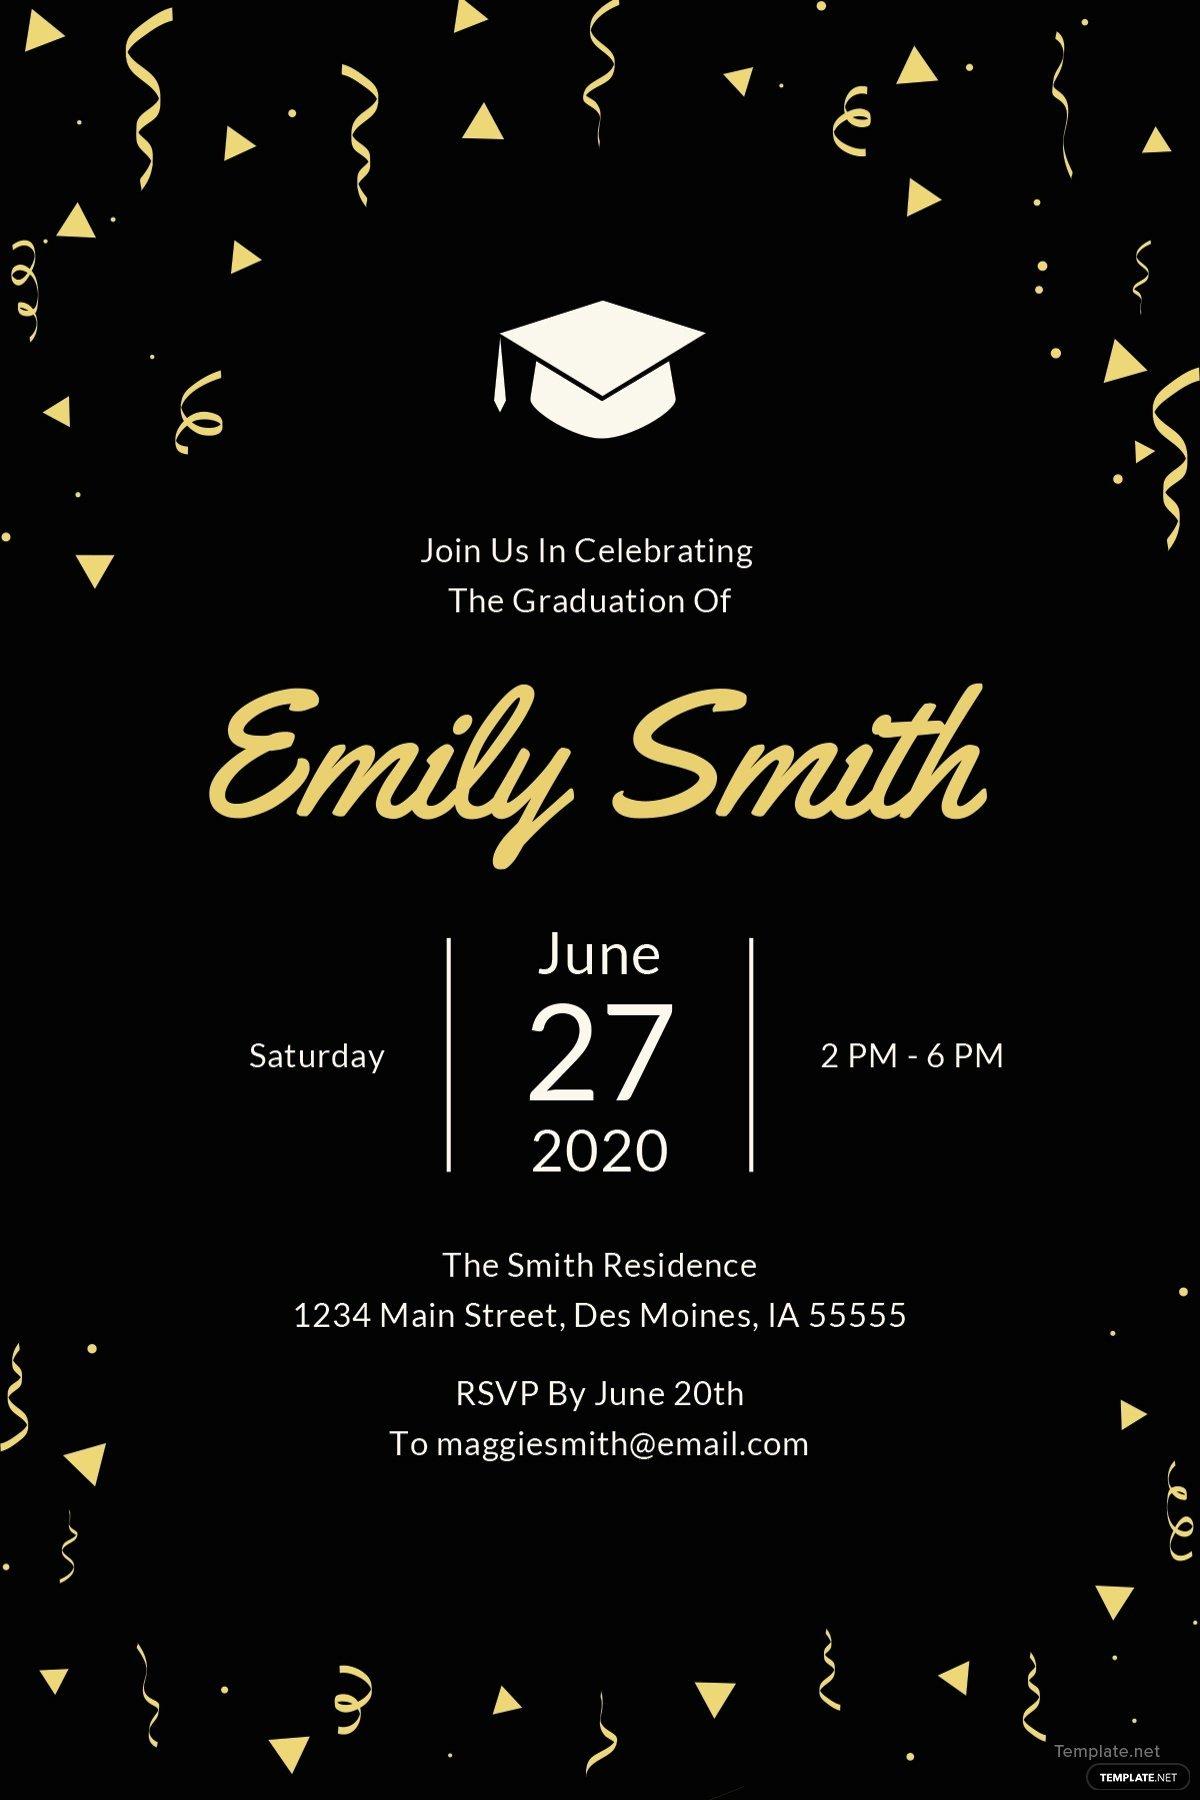 Template for Graduation Invitation New Free Graduation Invitation Template In Microsoft Word